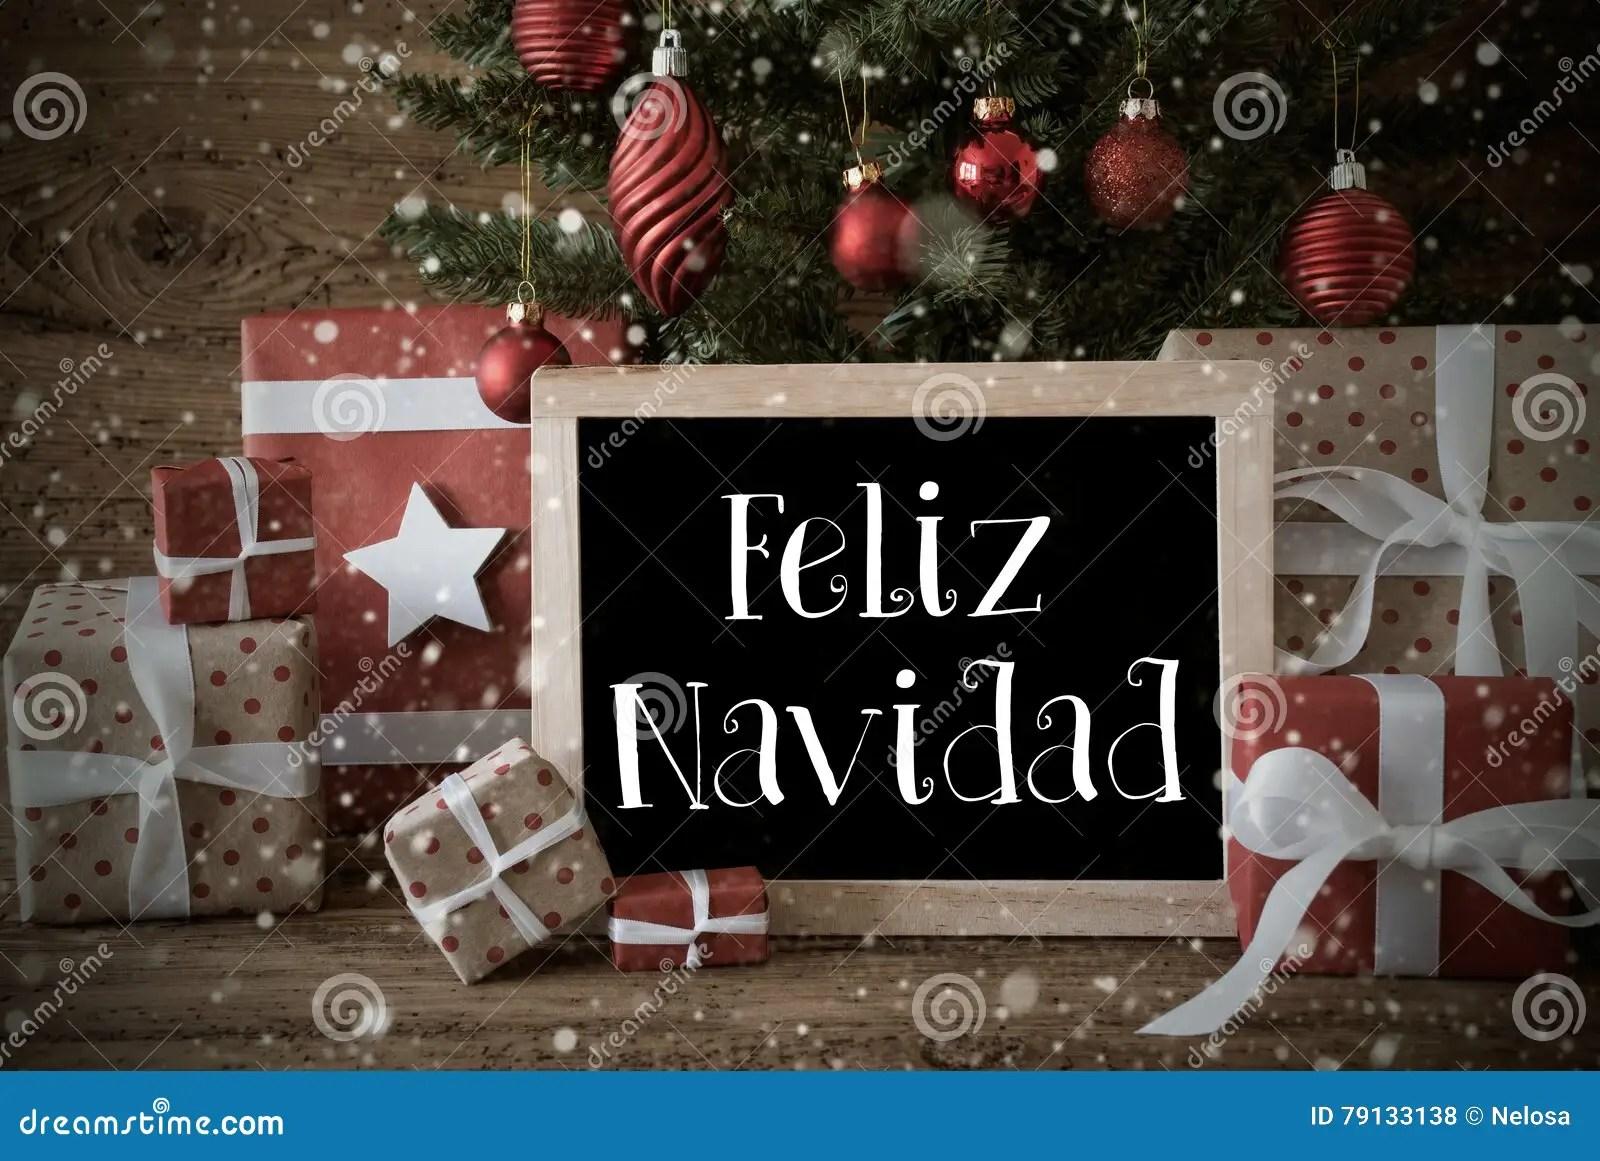 Nostalgic Tree Snowflakes Feliz Navidad Means Merry